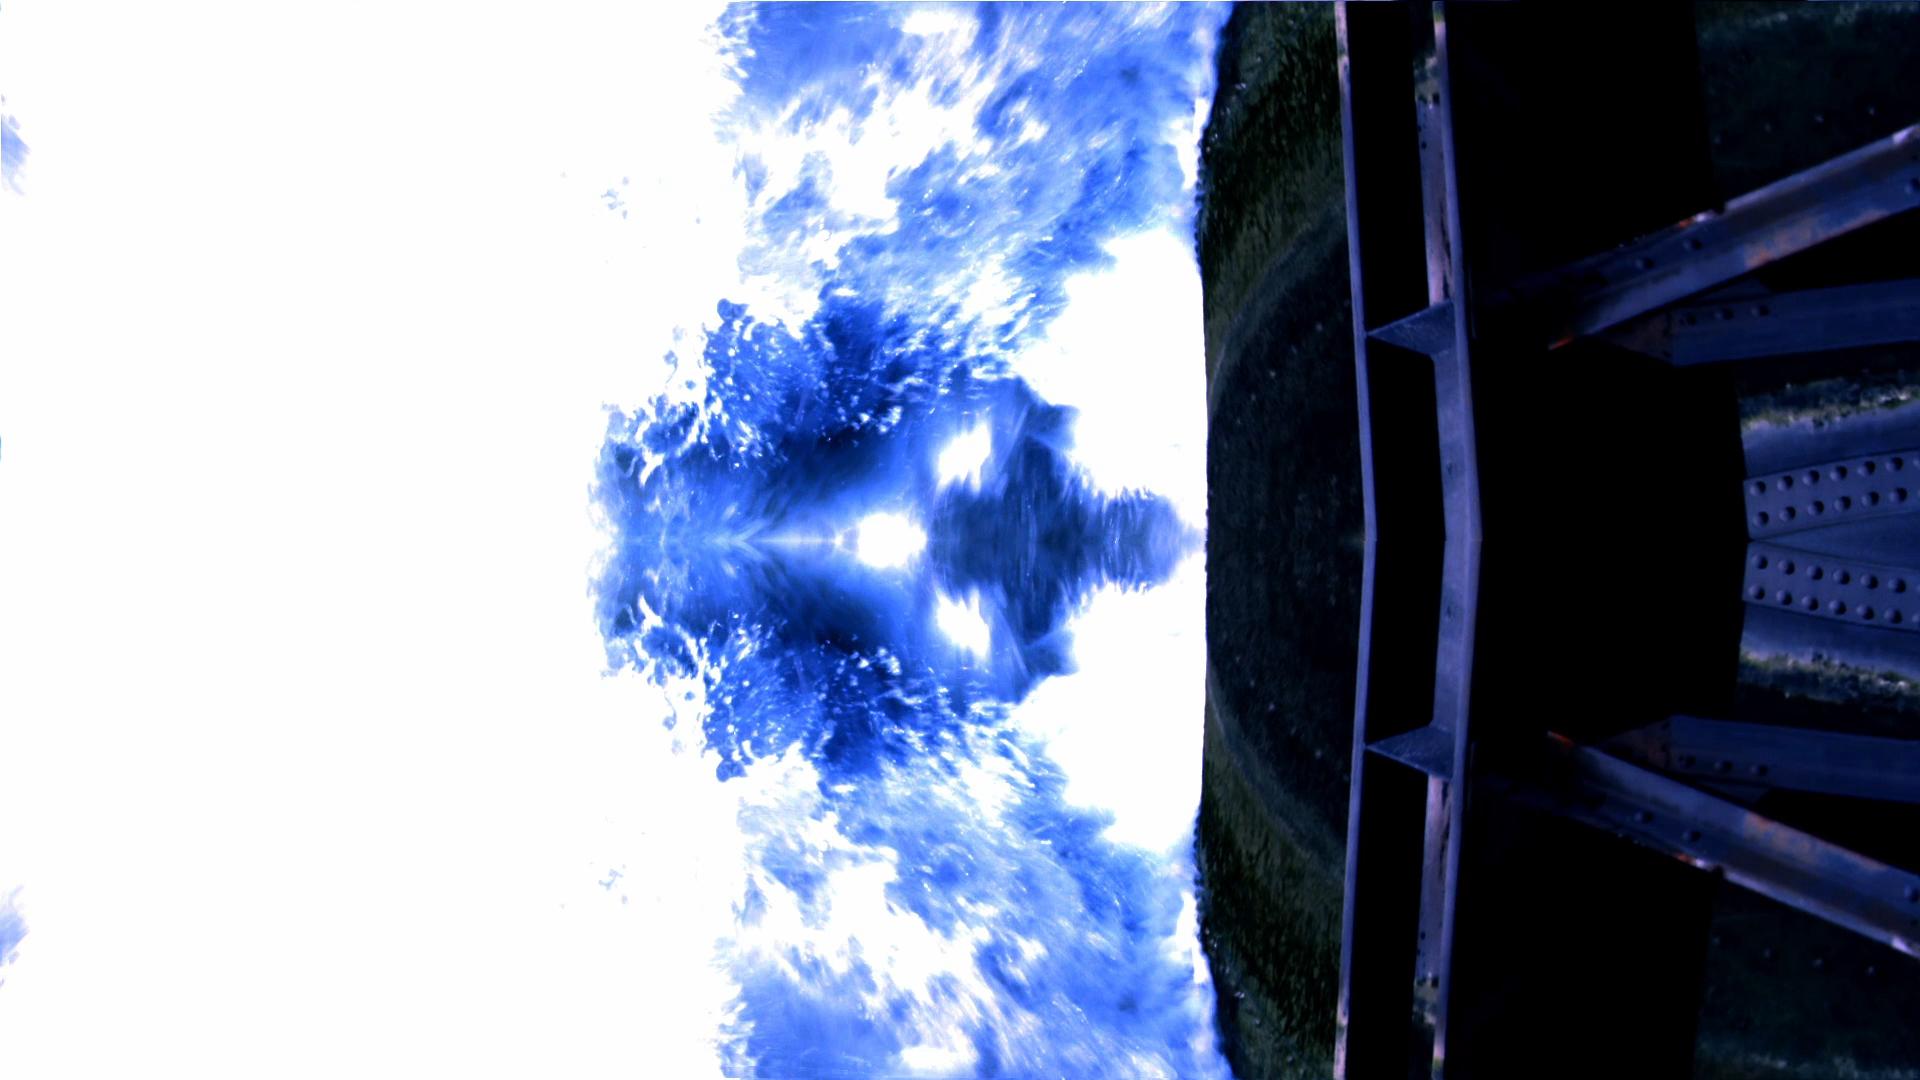 watergate01.jpg